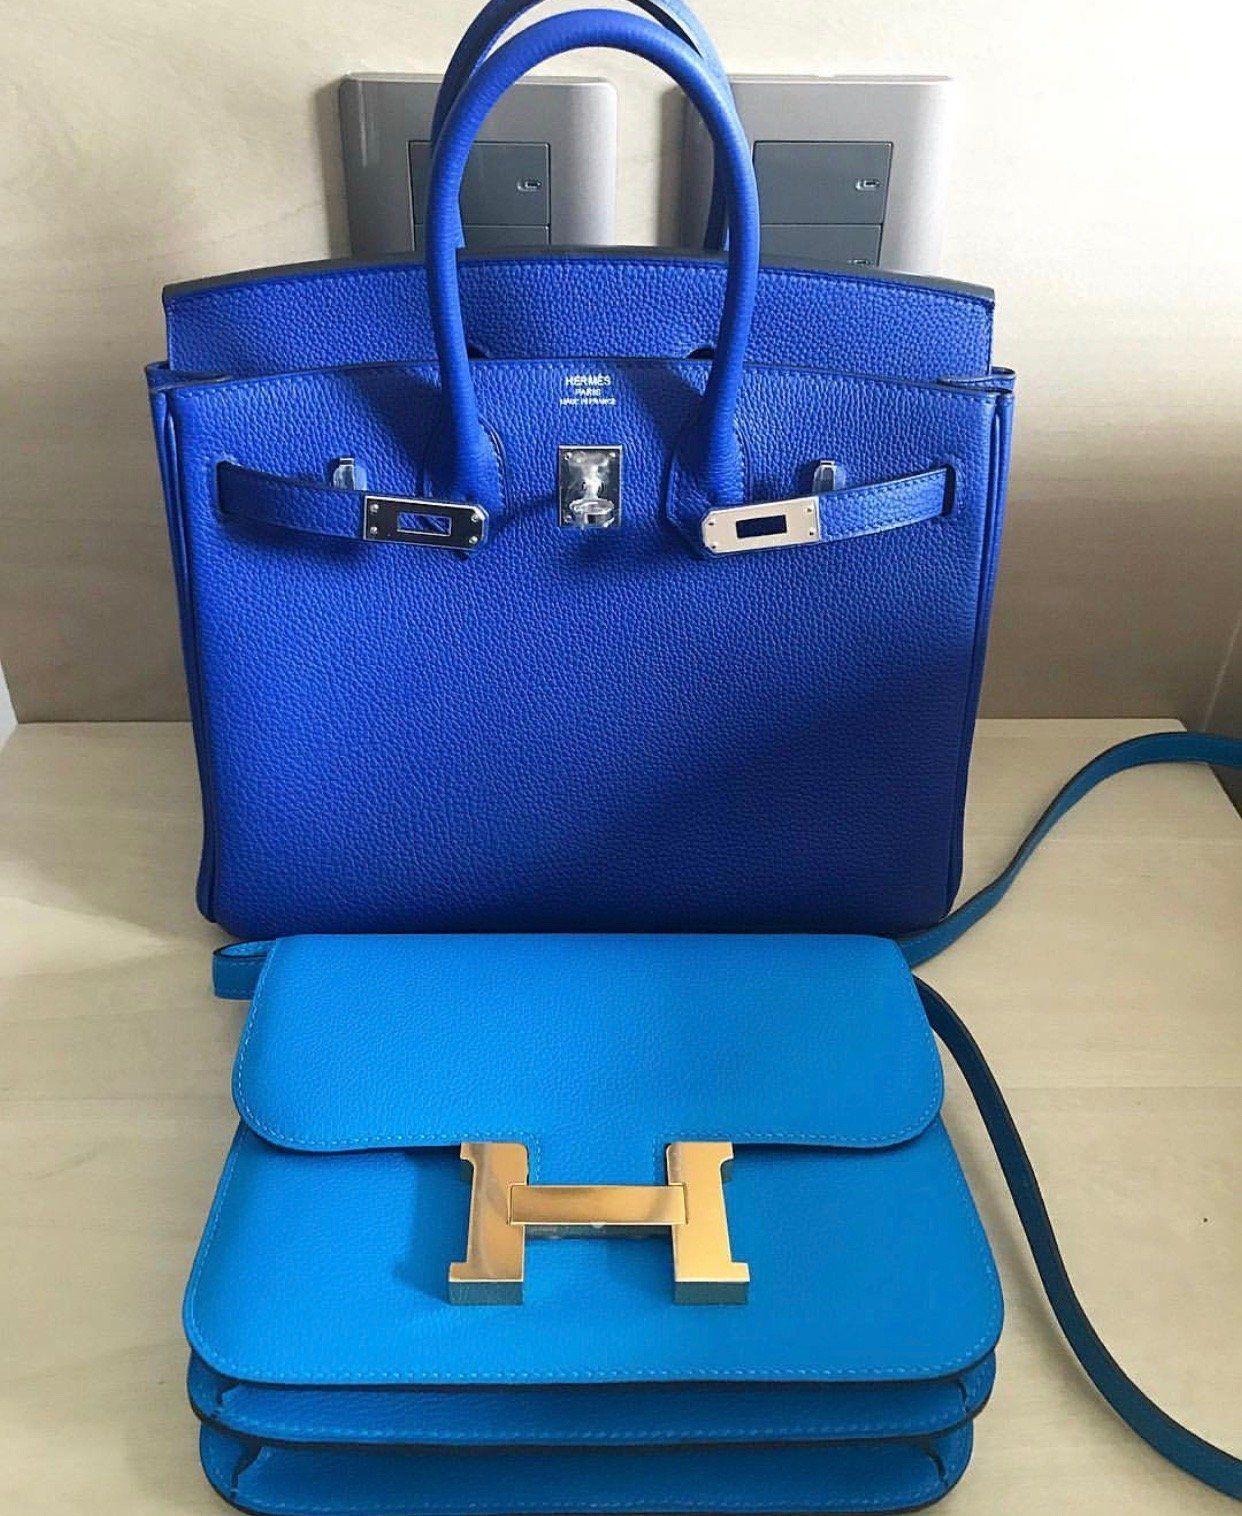 69ab4e5196a7 Hermès New Colors Spring 2019 - PurseBop Hermes Bags